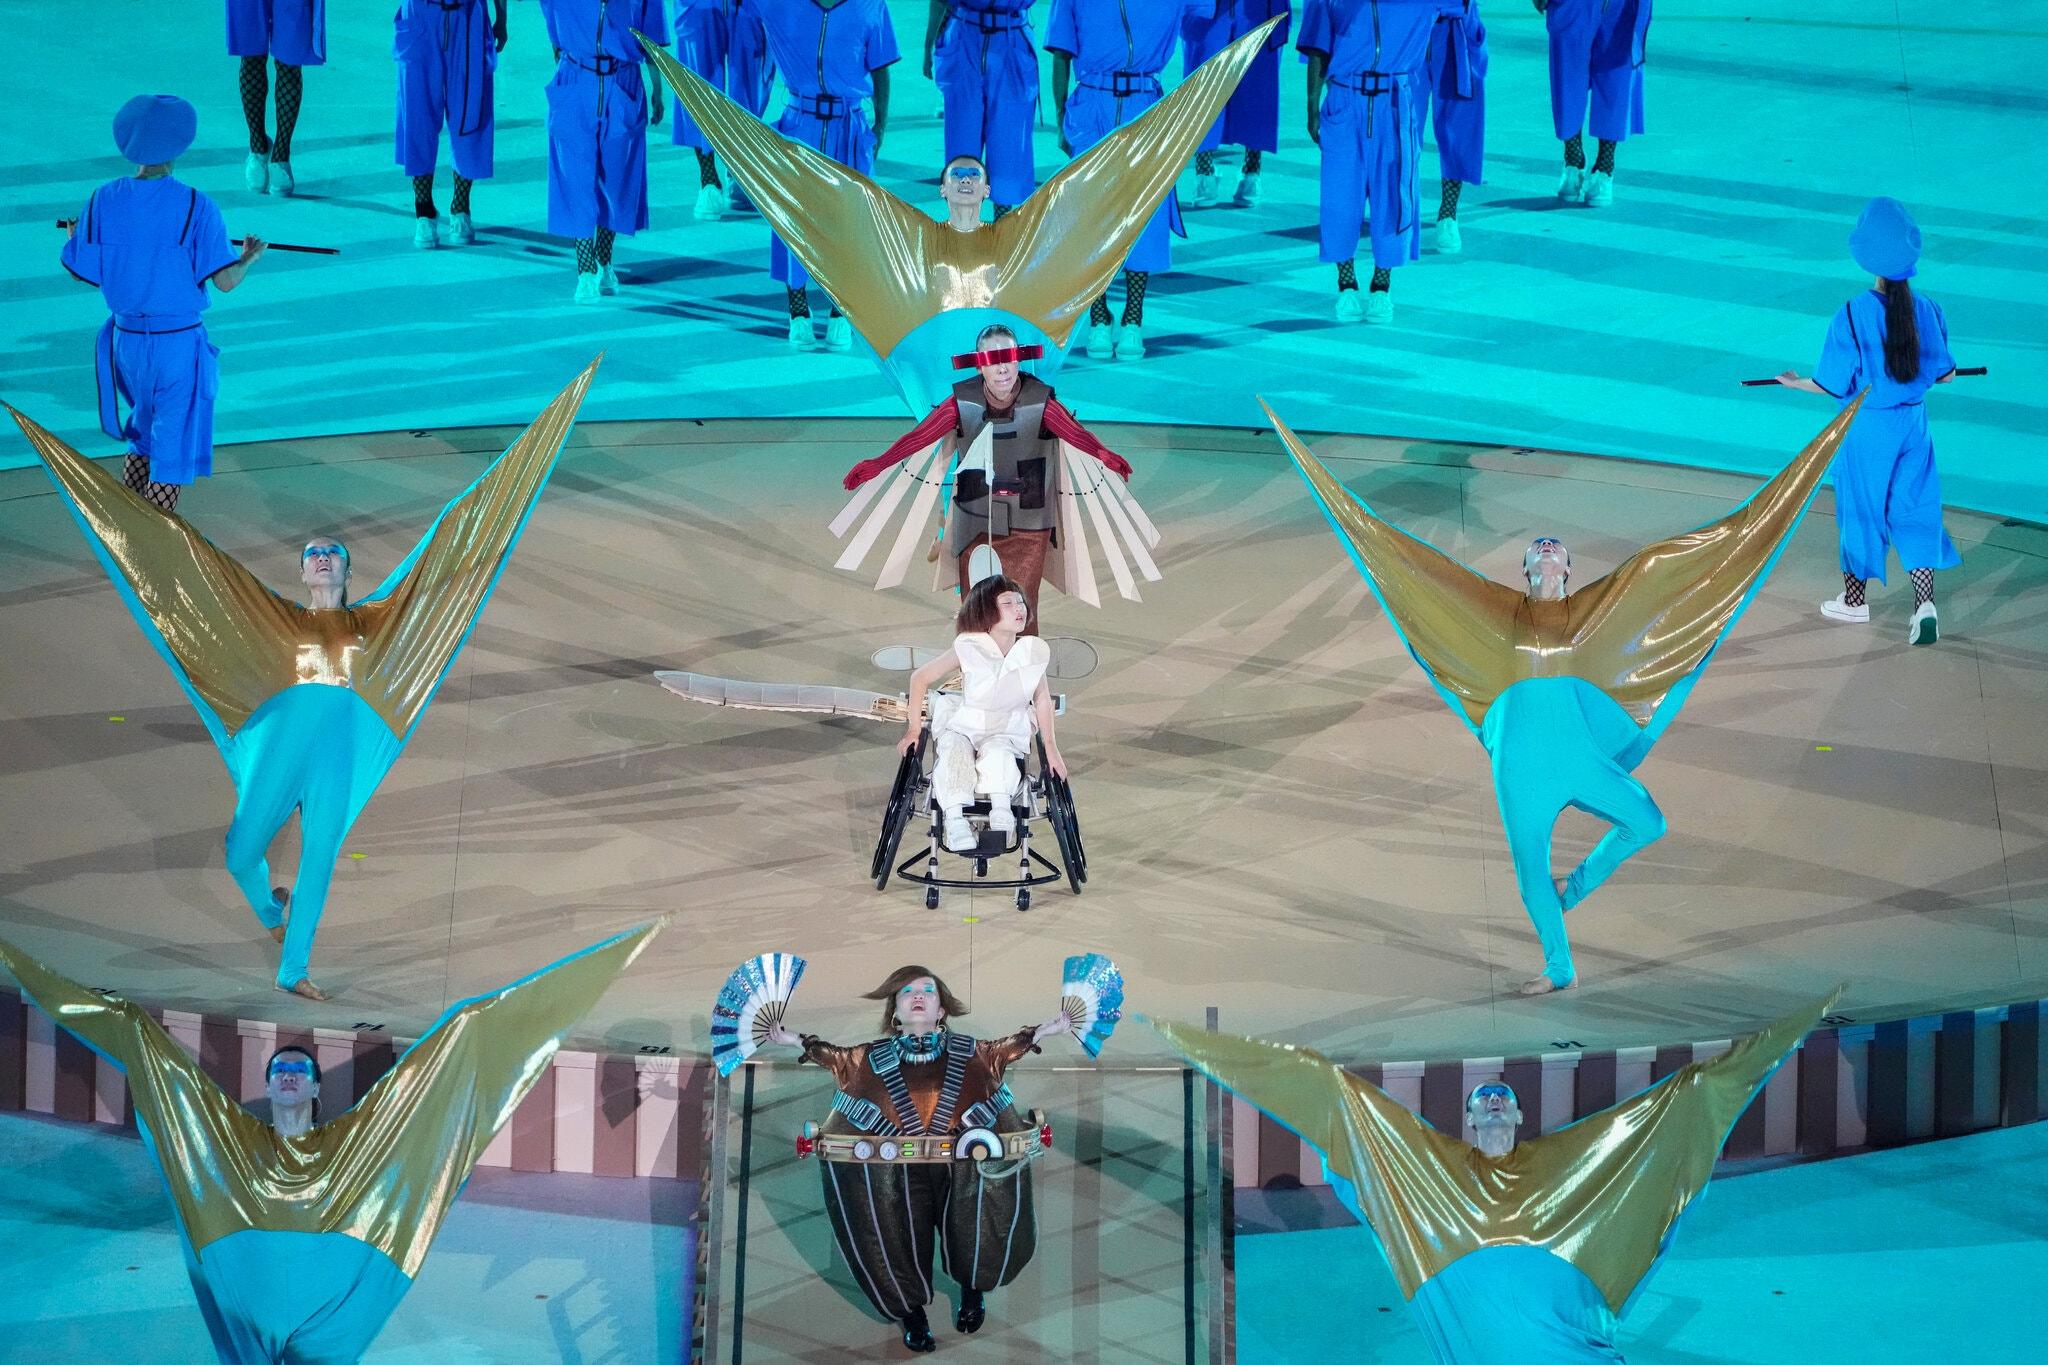 24paralympic-briefing-photo-performances2-superJumbo